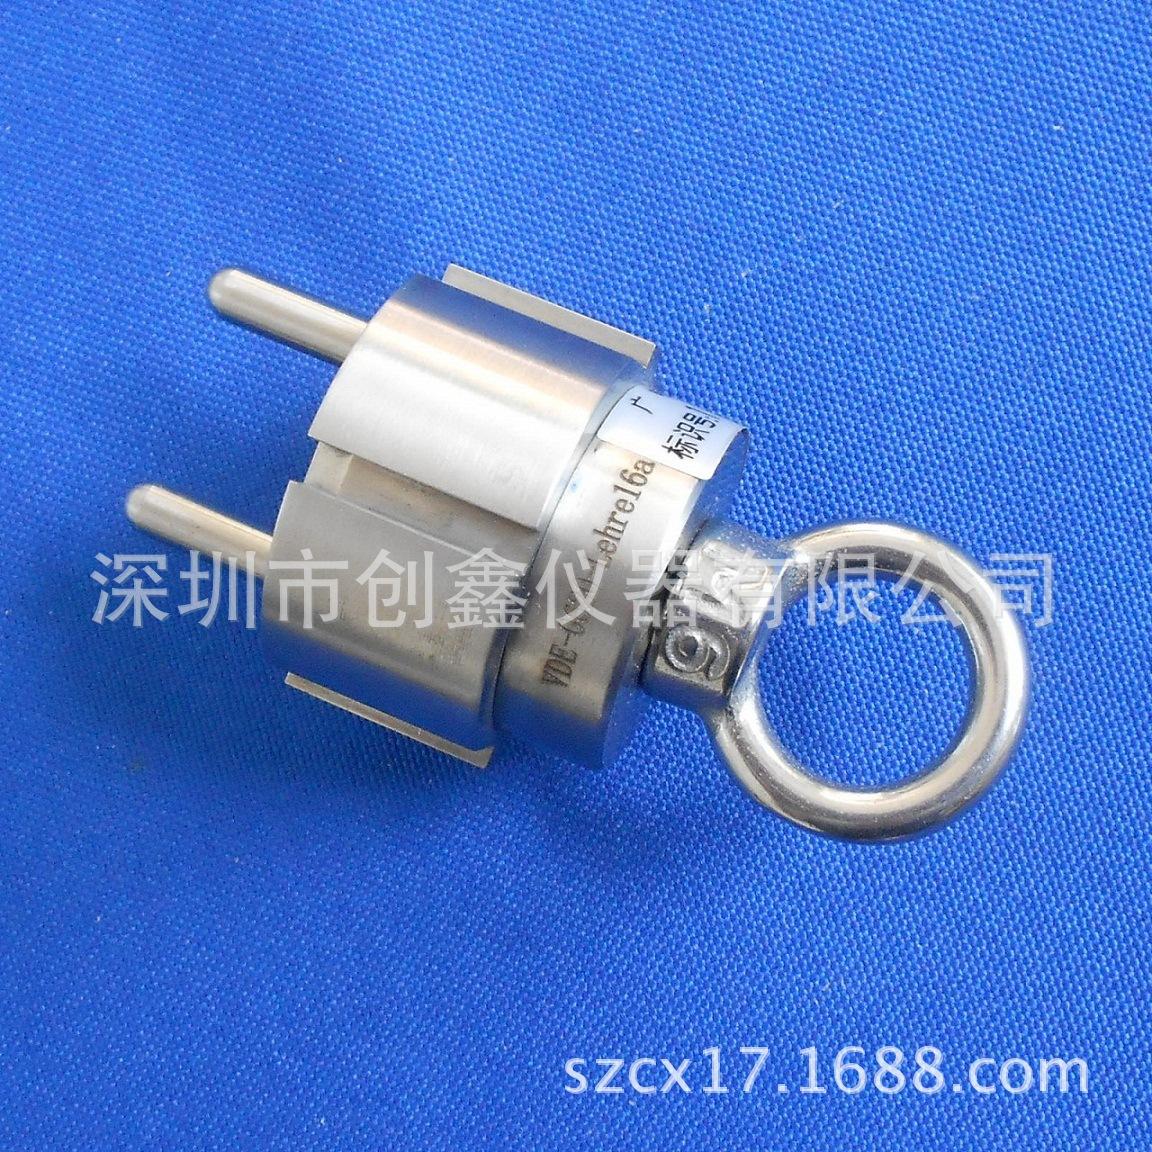 VDE0620德标插头插座量规